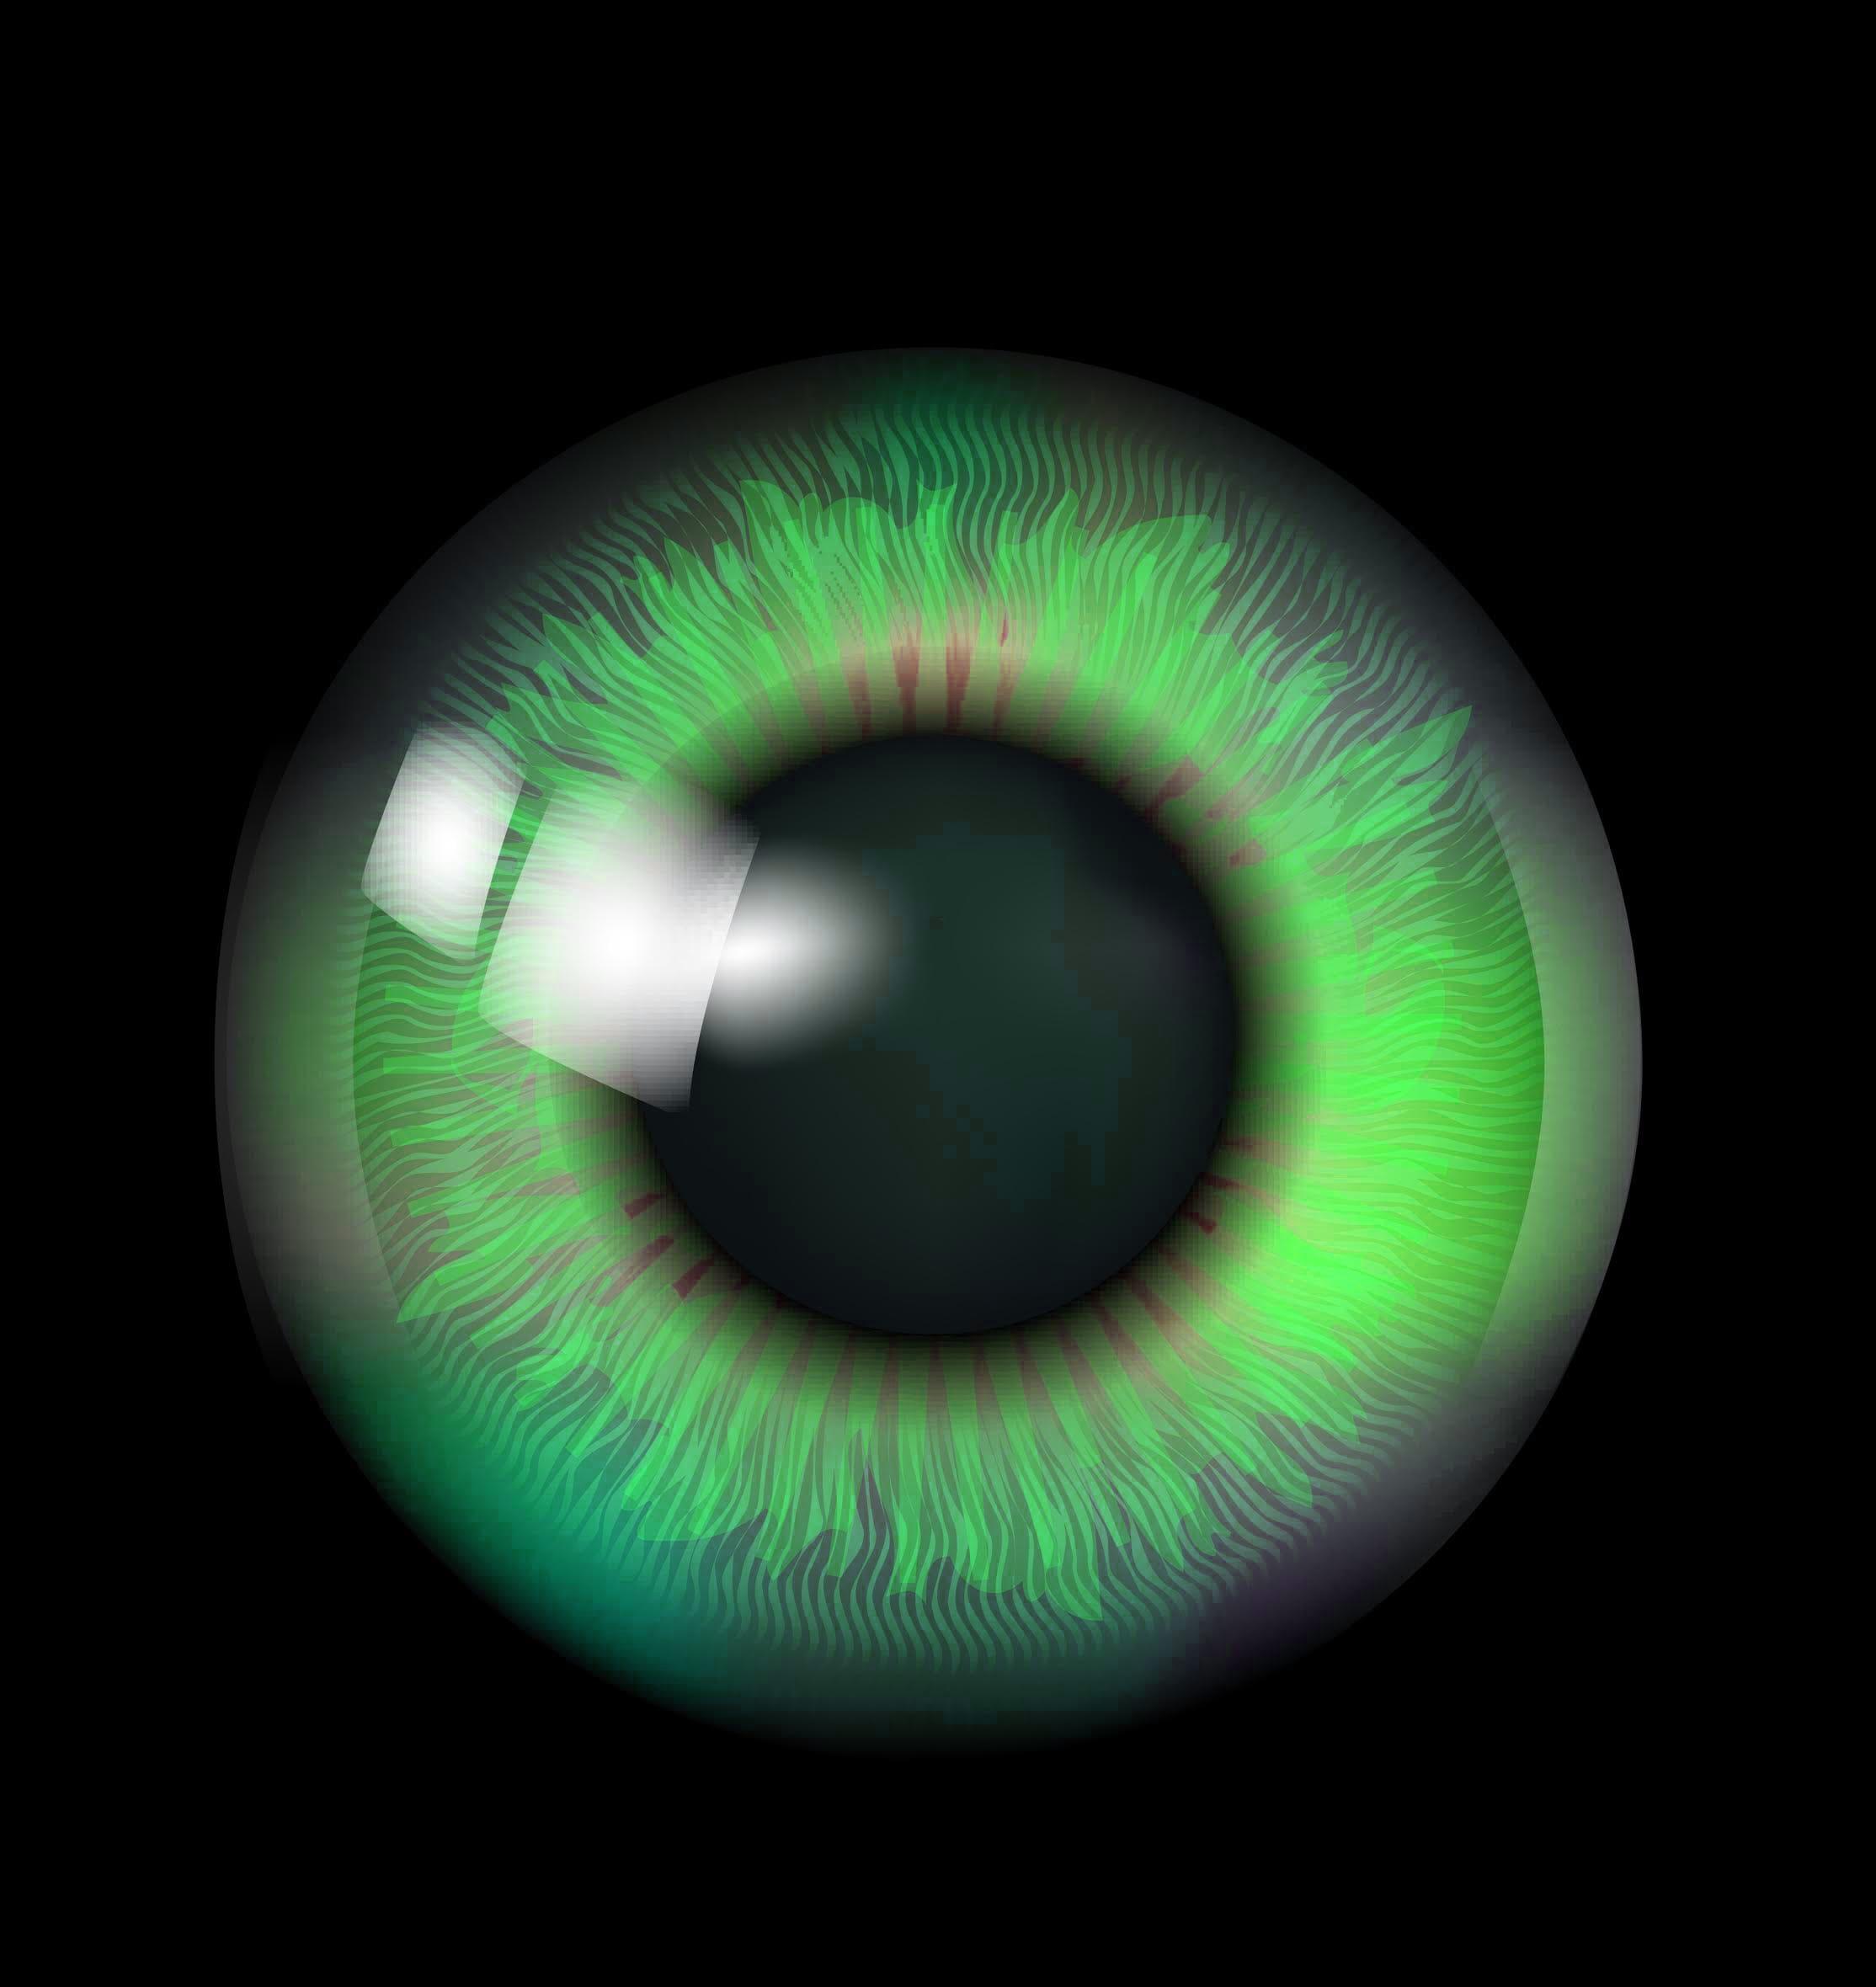 A large green eye